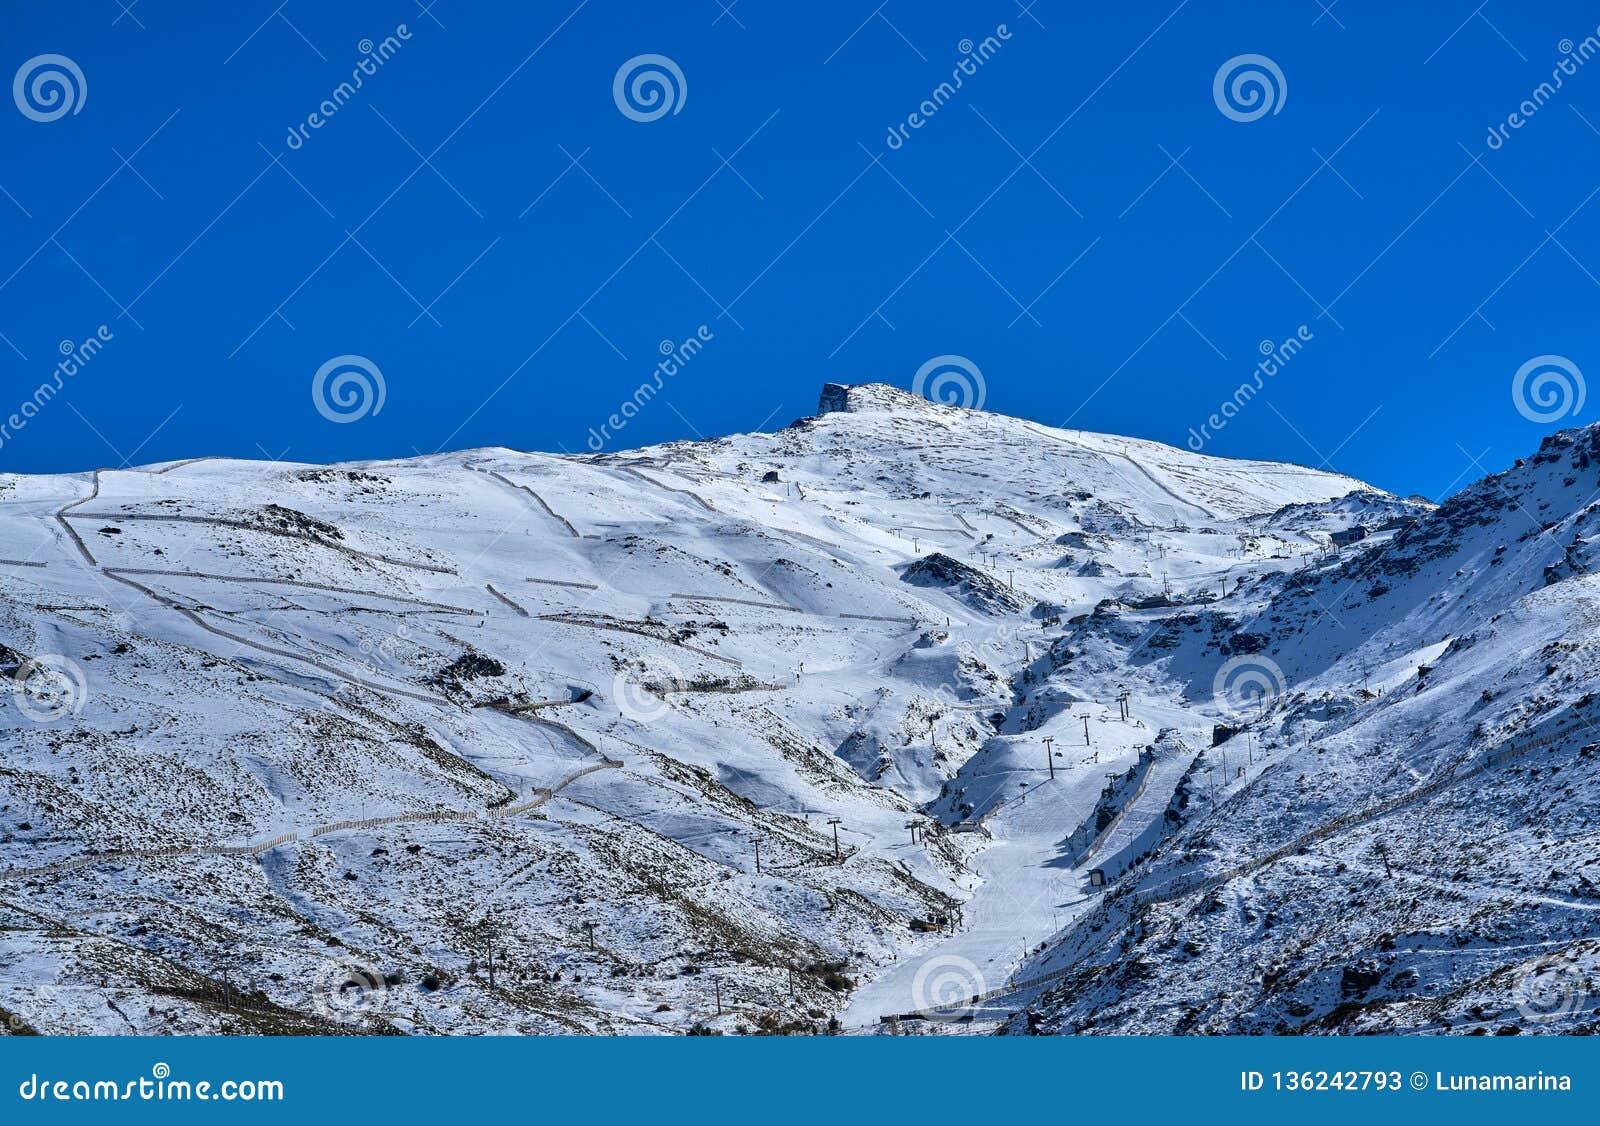 Station De Sports D Hiver De Montagne De Sierra Nevada Grenade Image Stock Image Du Station Grenade 136242793